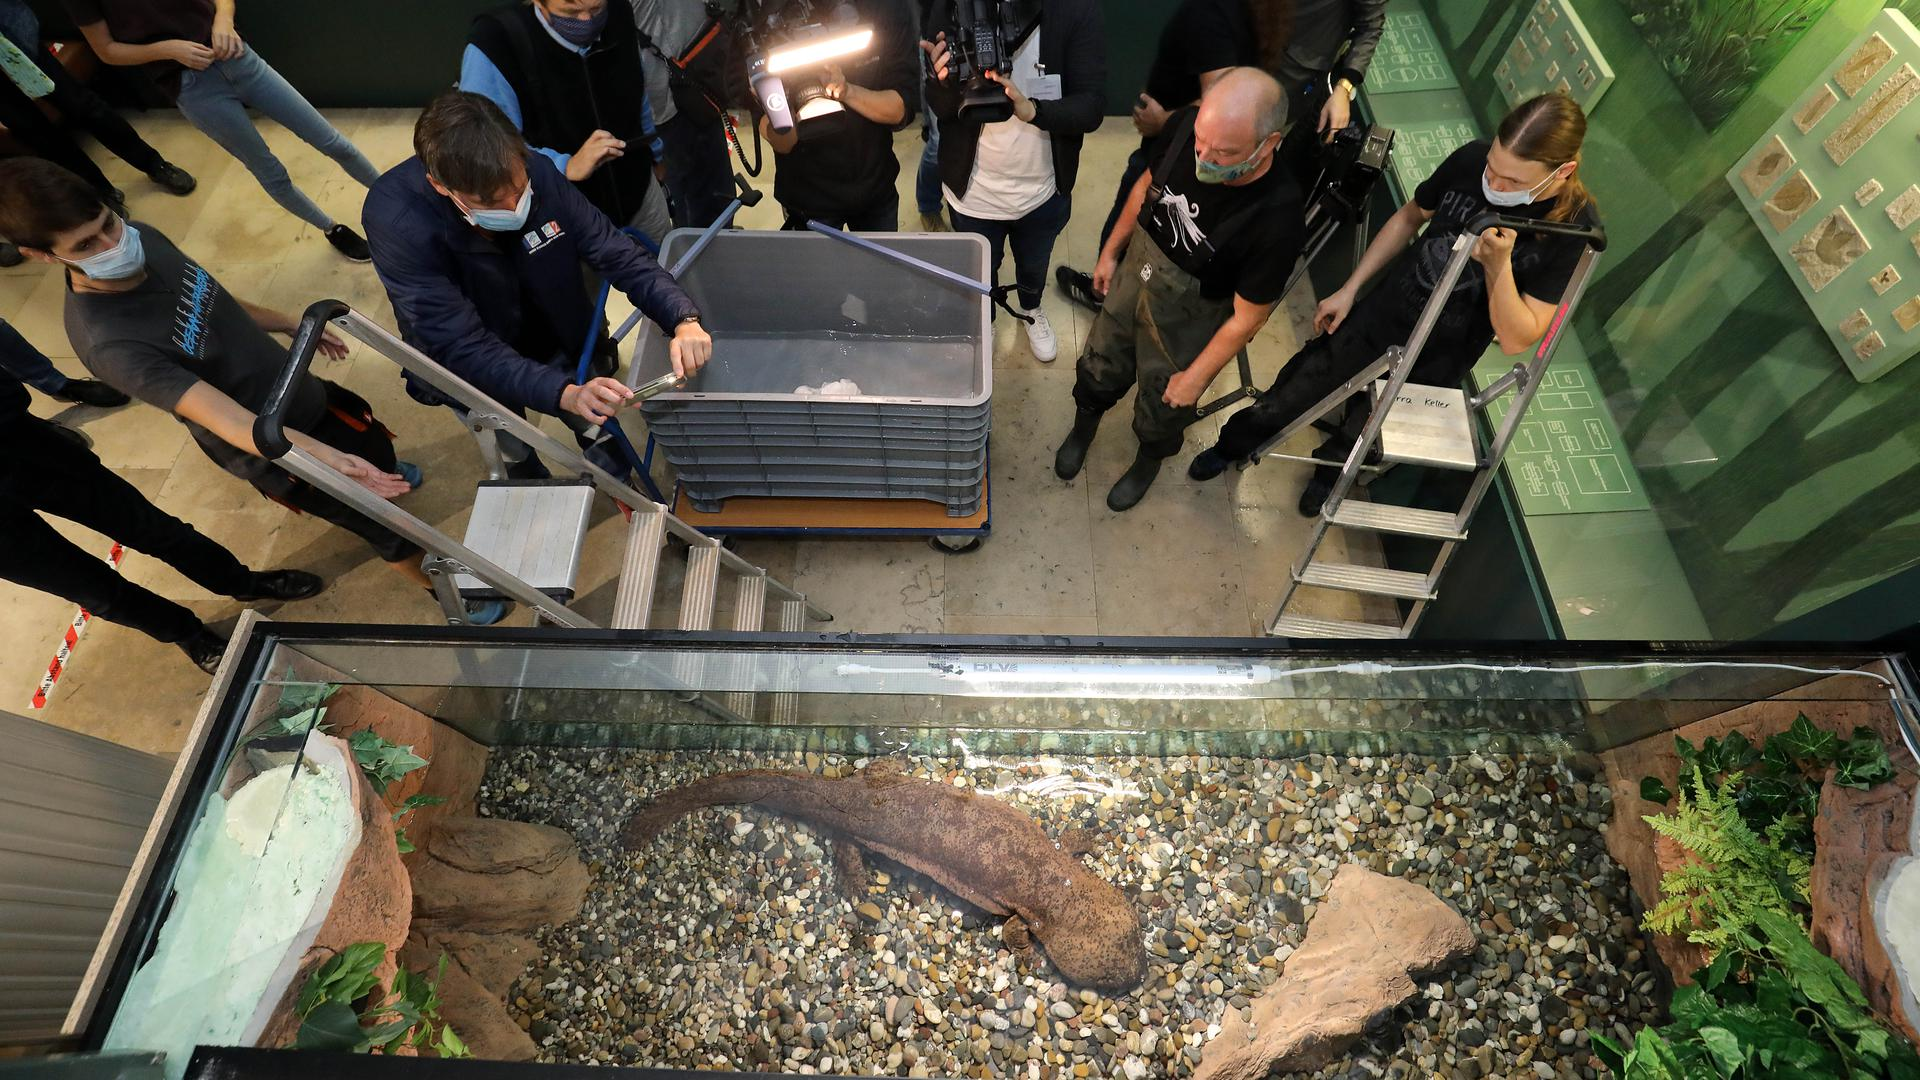 13.10.2020 Umzug Riesensalamander im Naturkundemuseum Karlsruhe